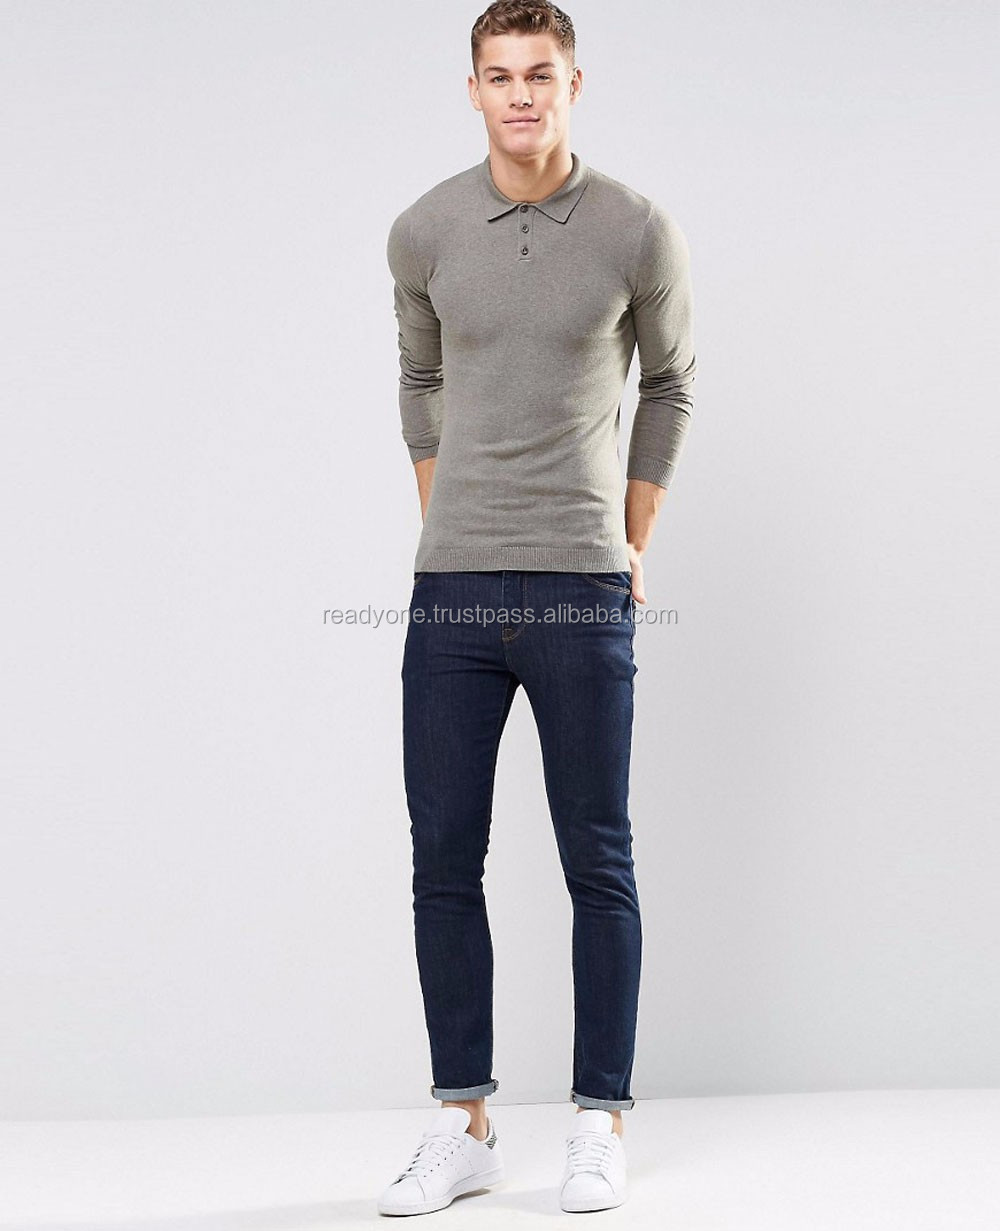 a515c70f0 Half Sleeve Polo Shirt Free Sample Polo Shirt Man Polo T-shirt - Buy ...